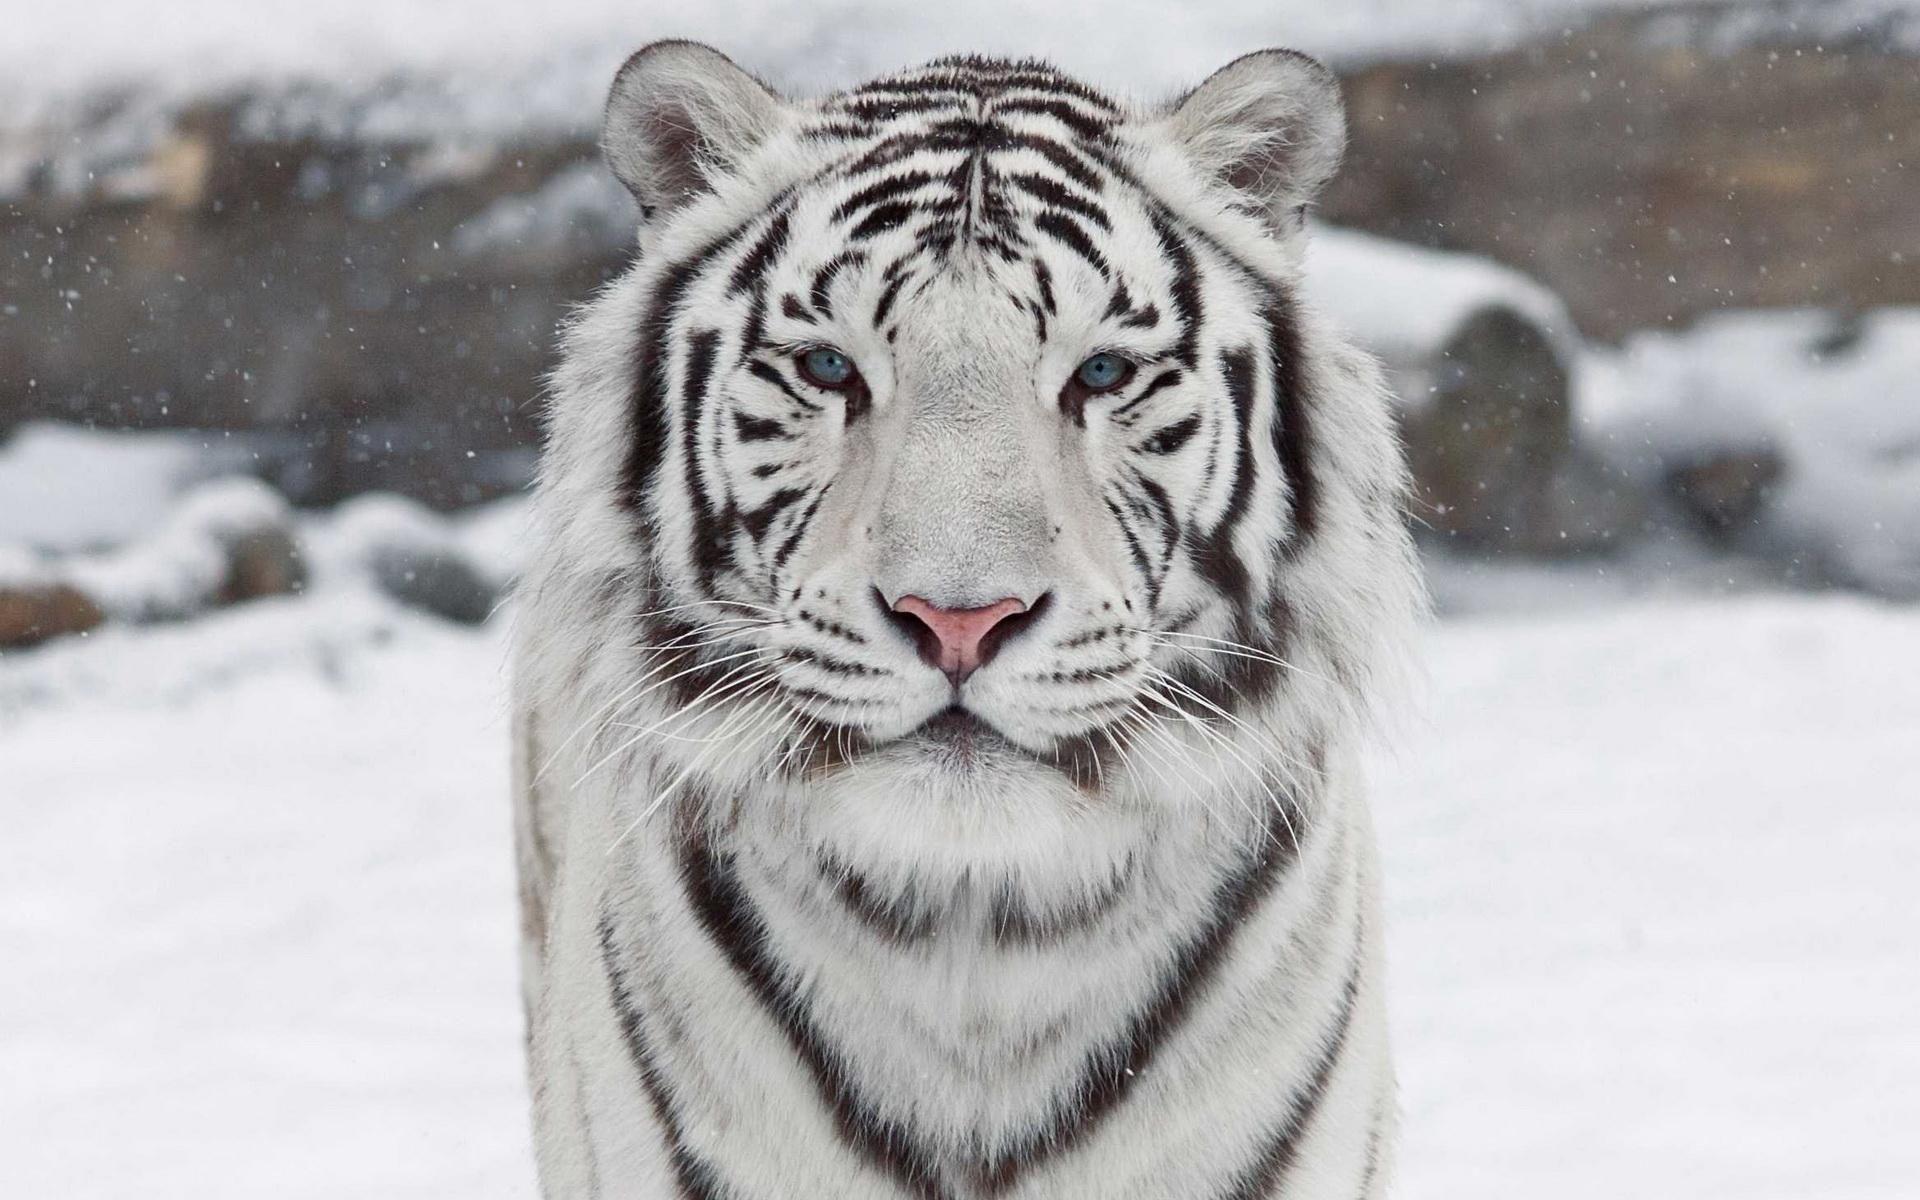 Animaux Tigre Blanc Big Cat Tigre Predator (Animal) Close-up Fond d'écran | Fond d'écran chat ...